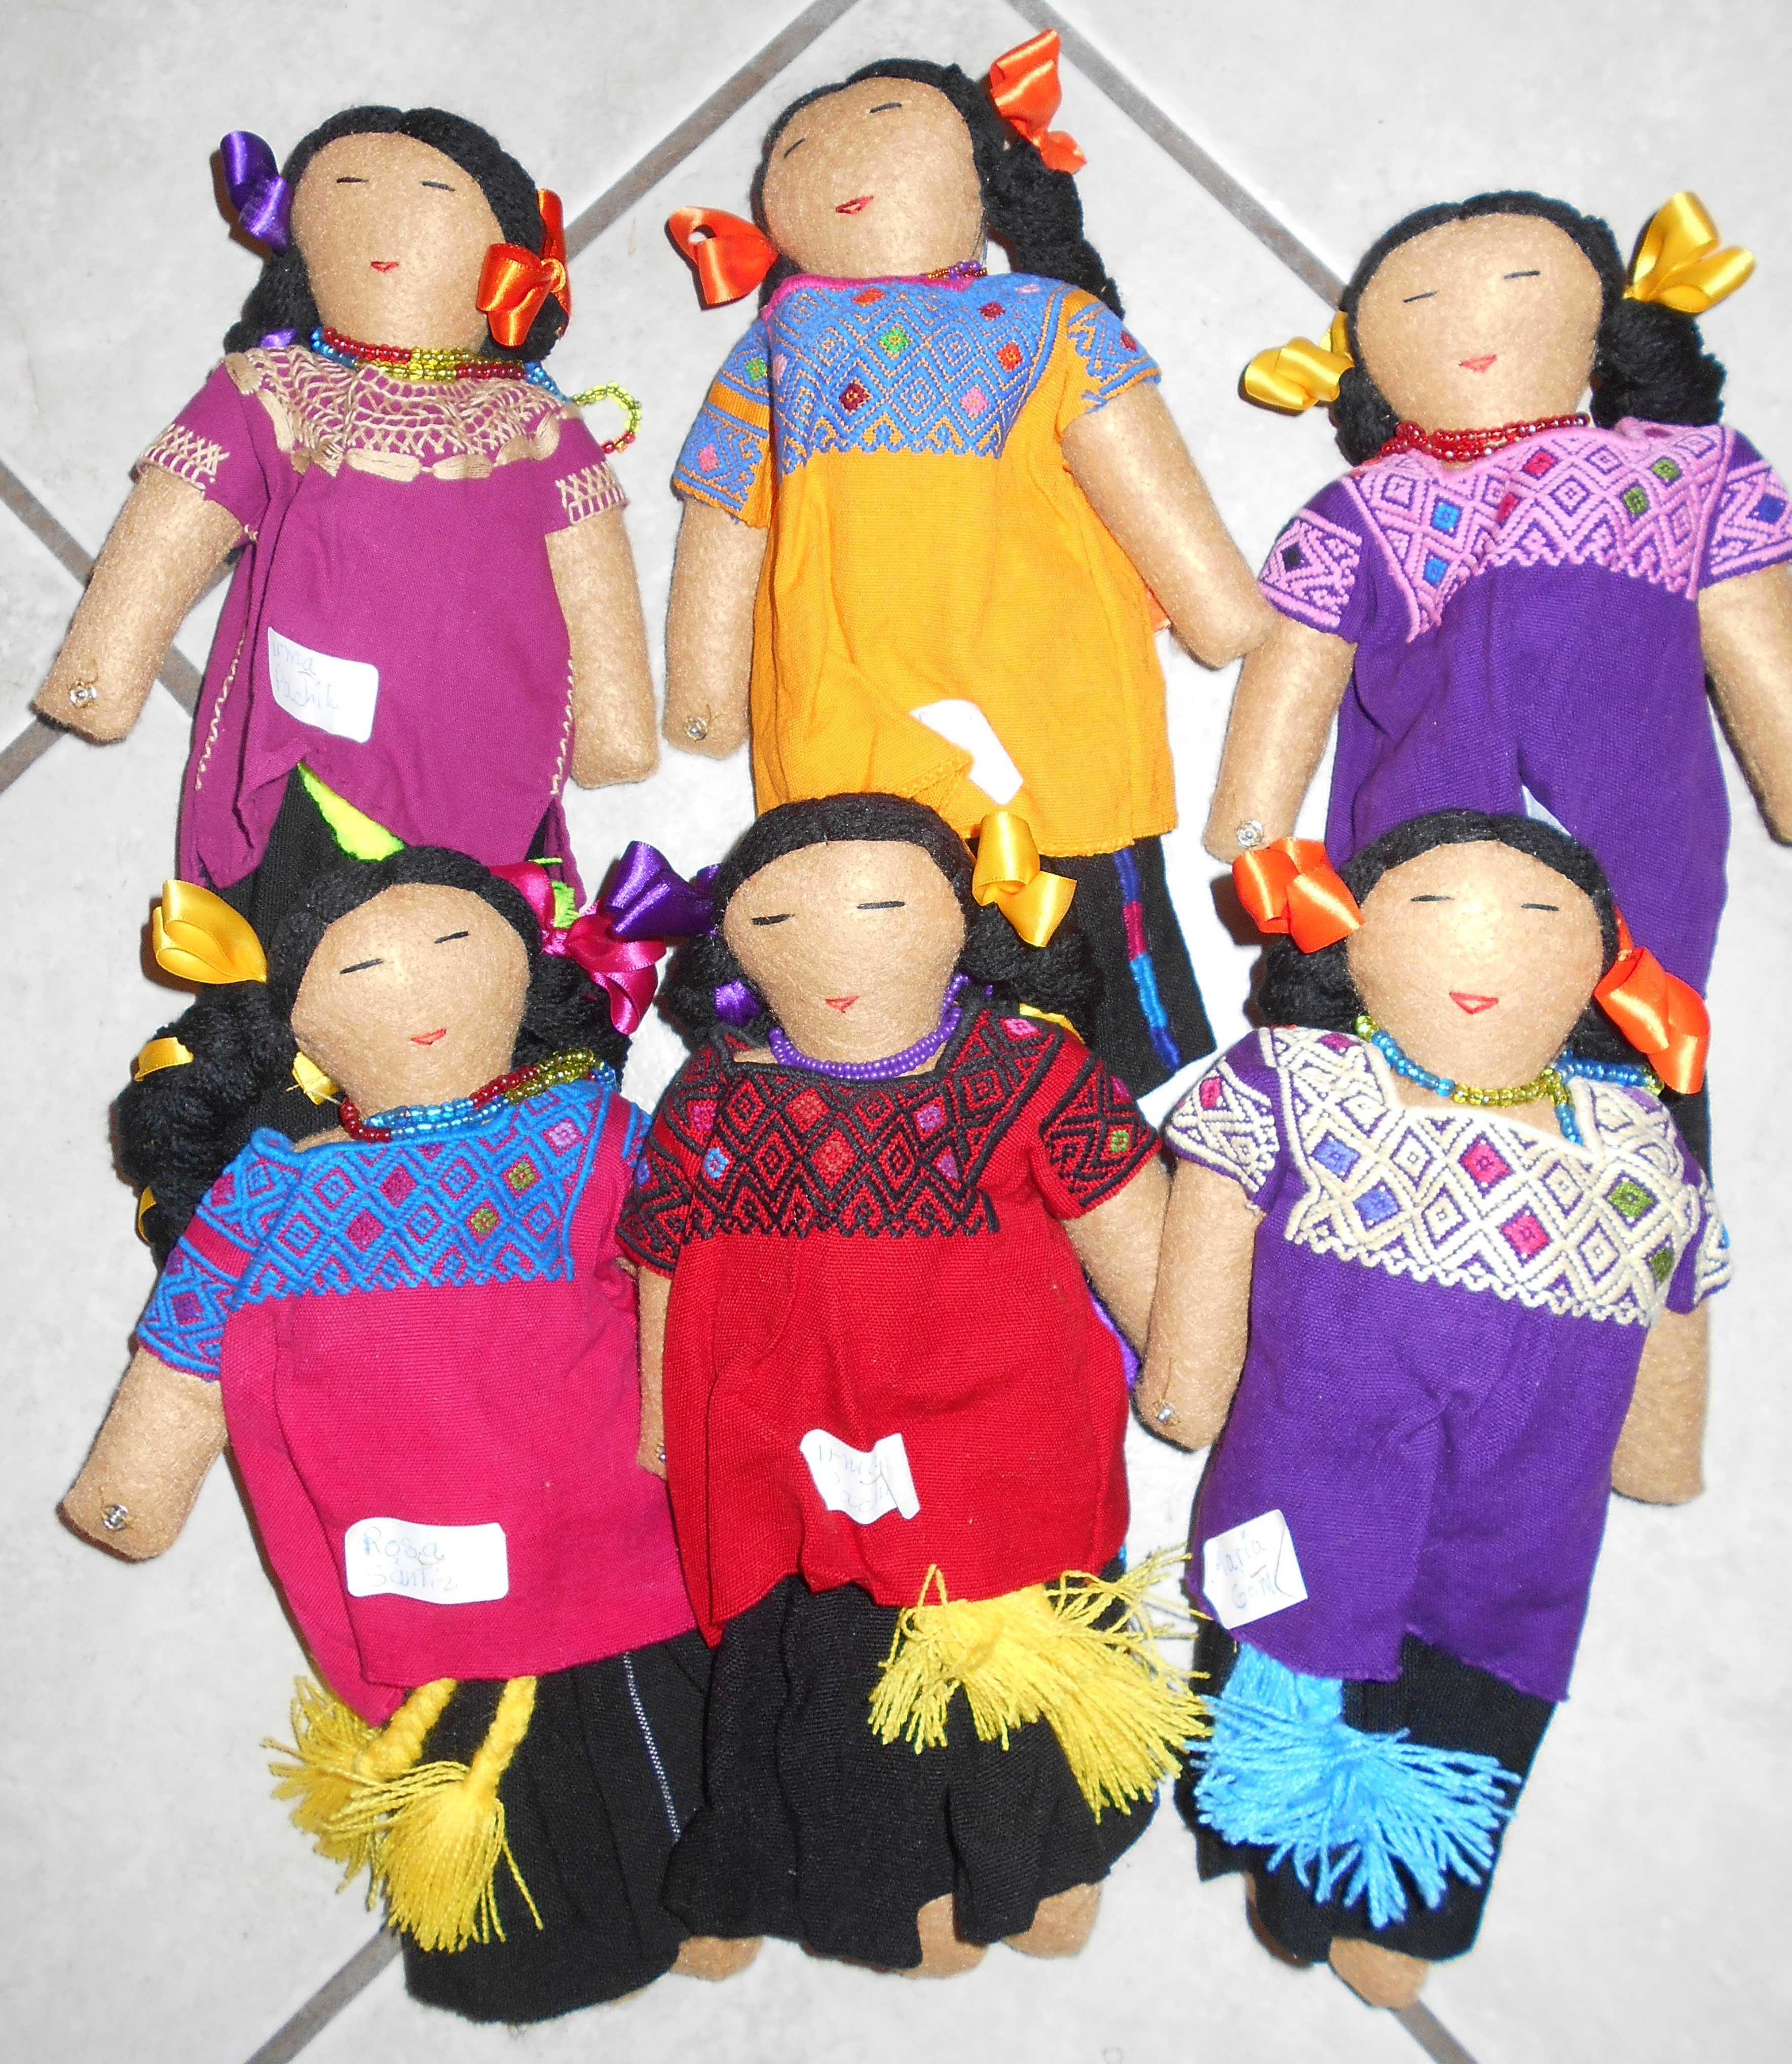 Children's cloth books in Tsotsil and Spanish